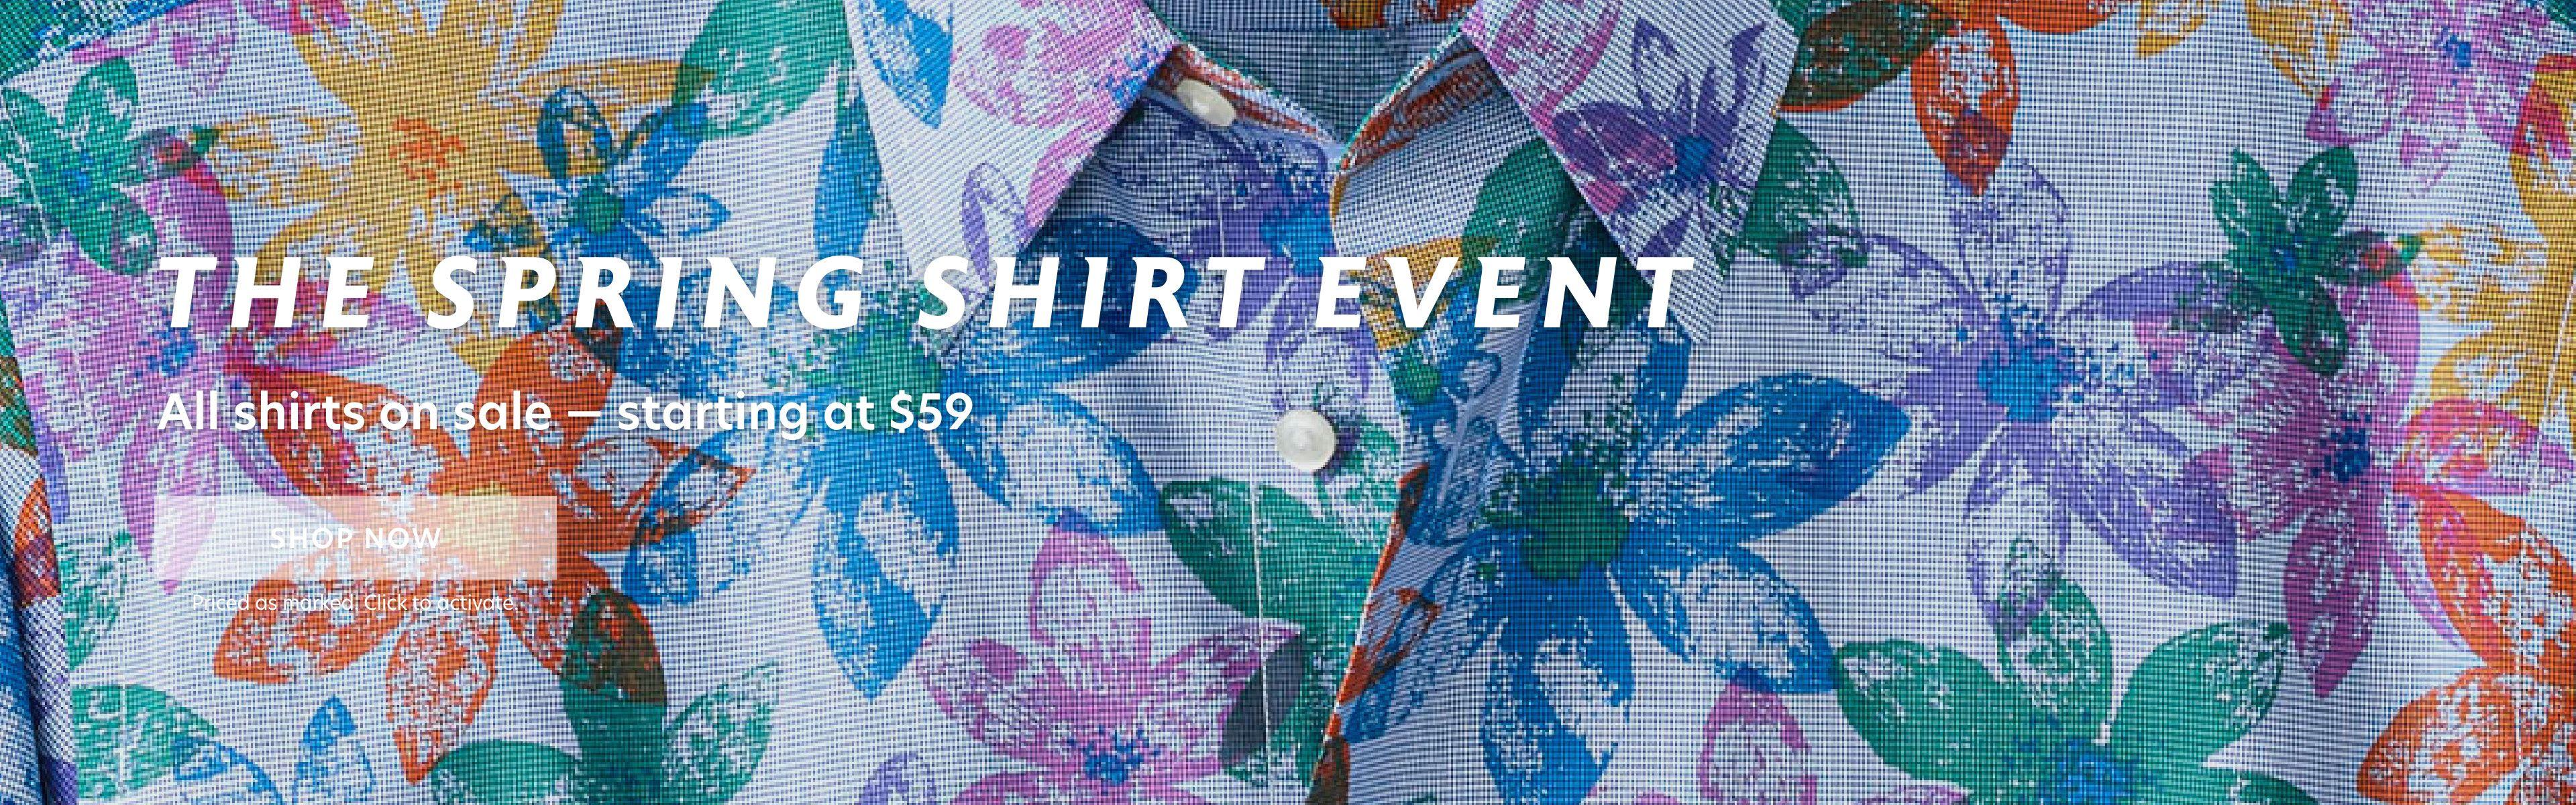 The Spring Shirt Event